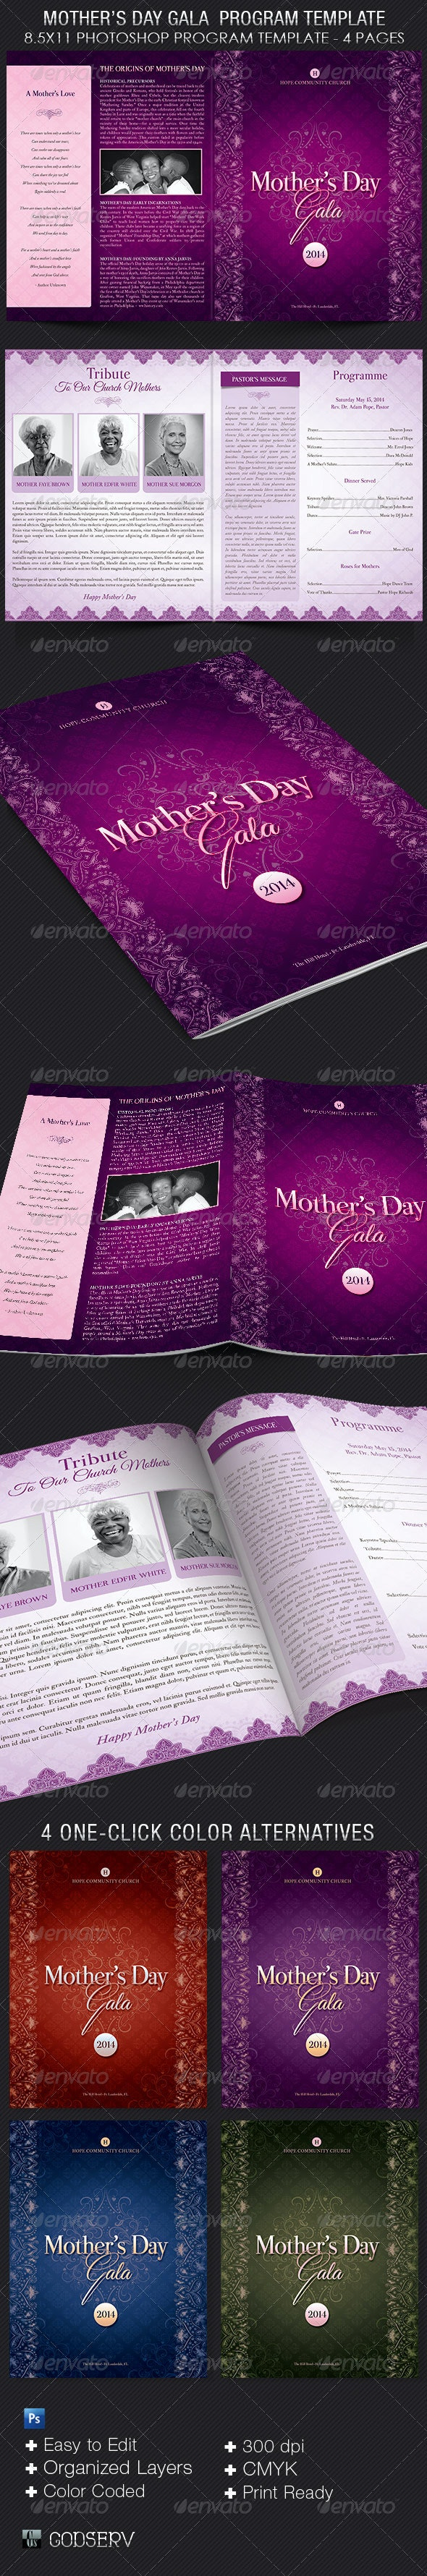 Lavender Mothers Day Gala Program Template - Informational Brochures